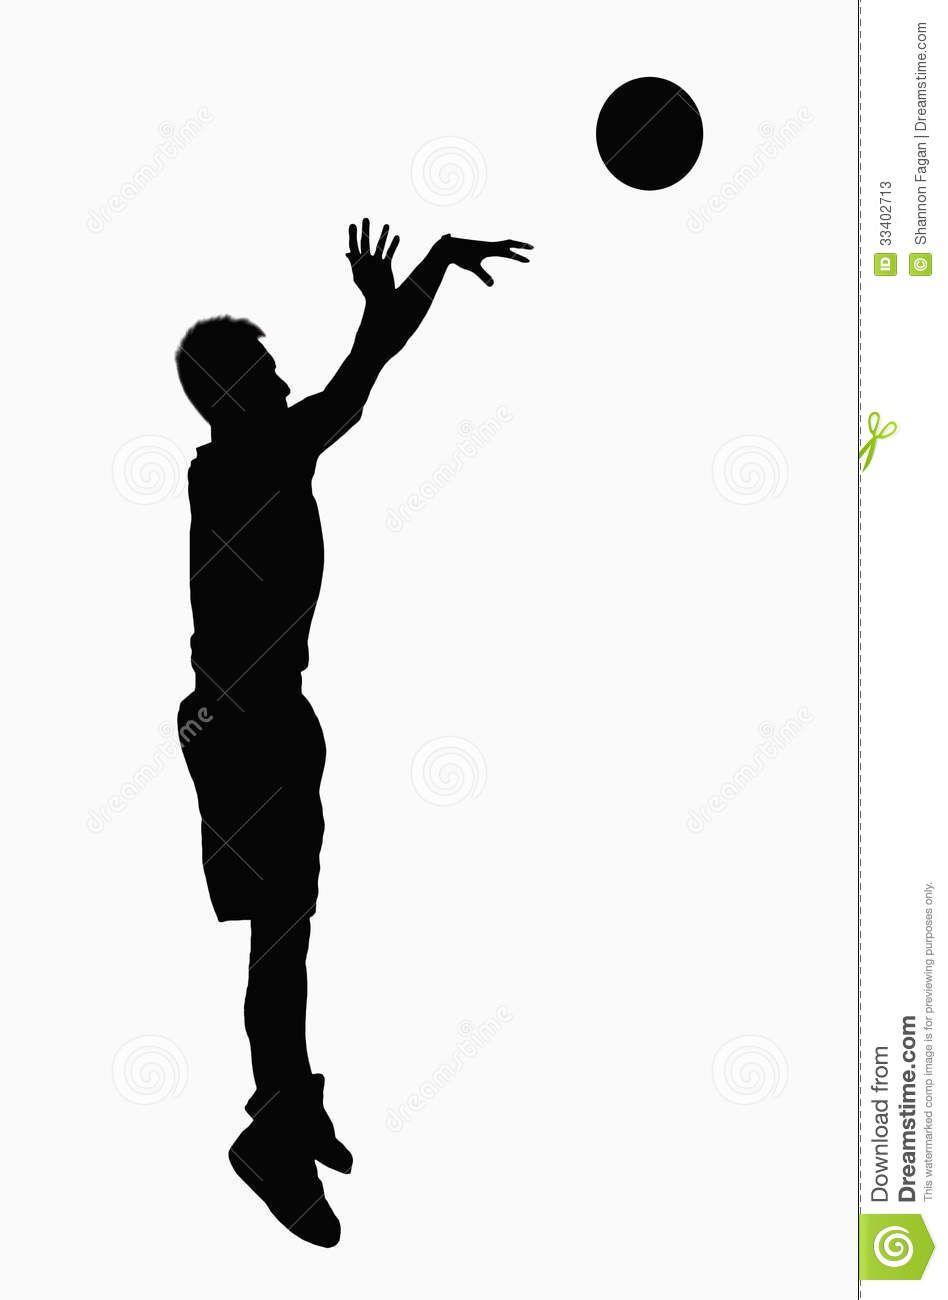 948x1300 Basketball Shooter Silhouette